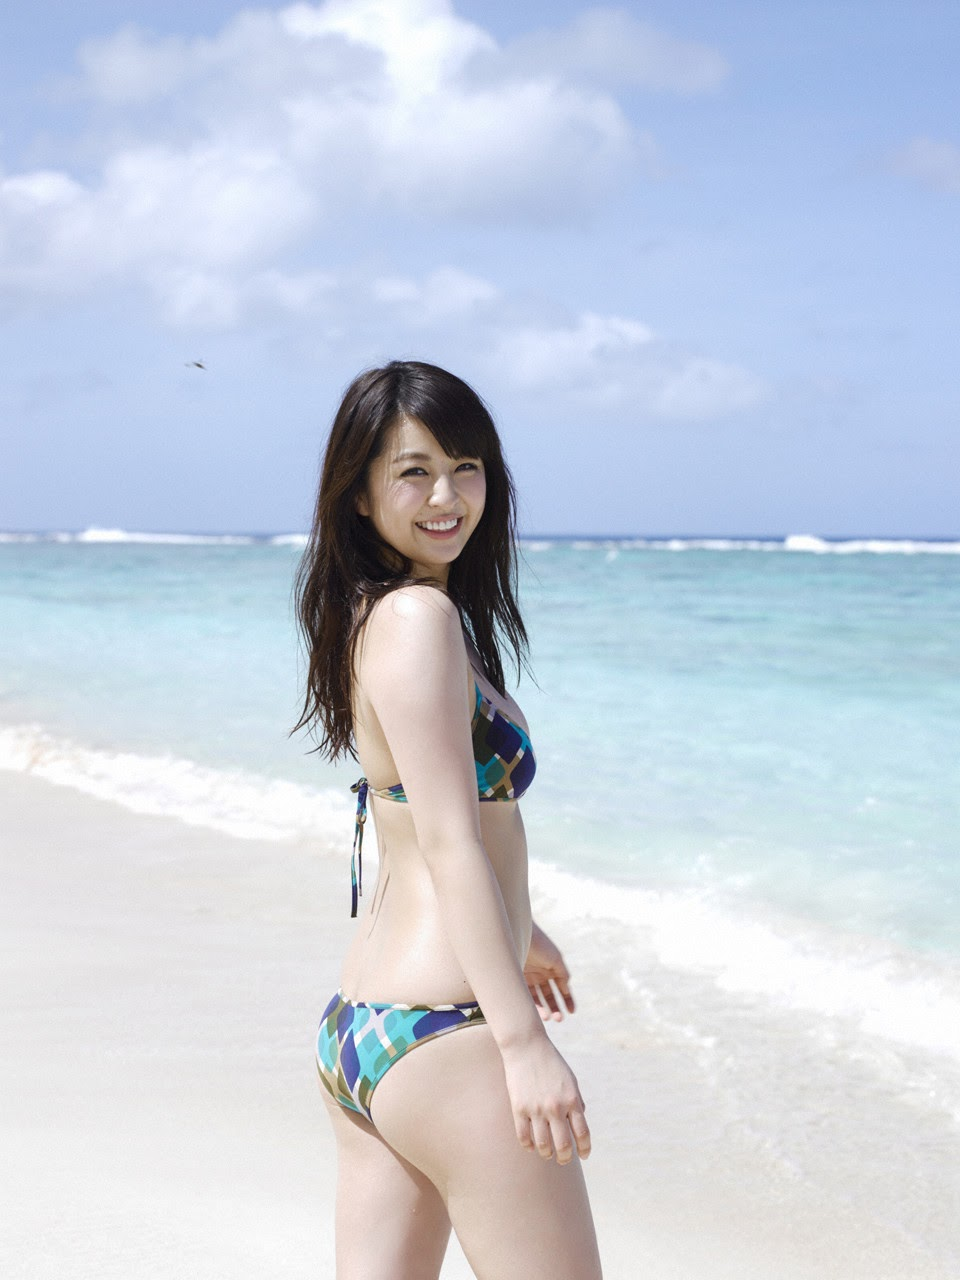 Bikini on a white sandy beach052